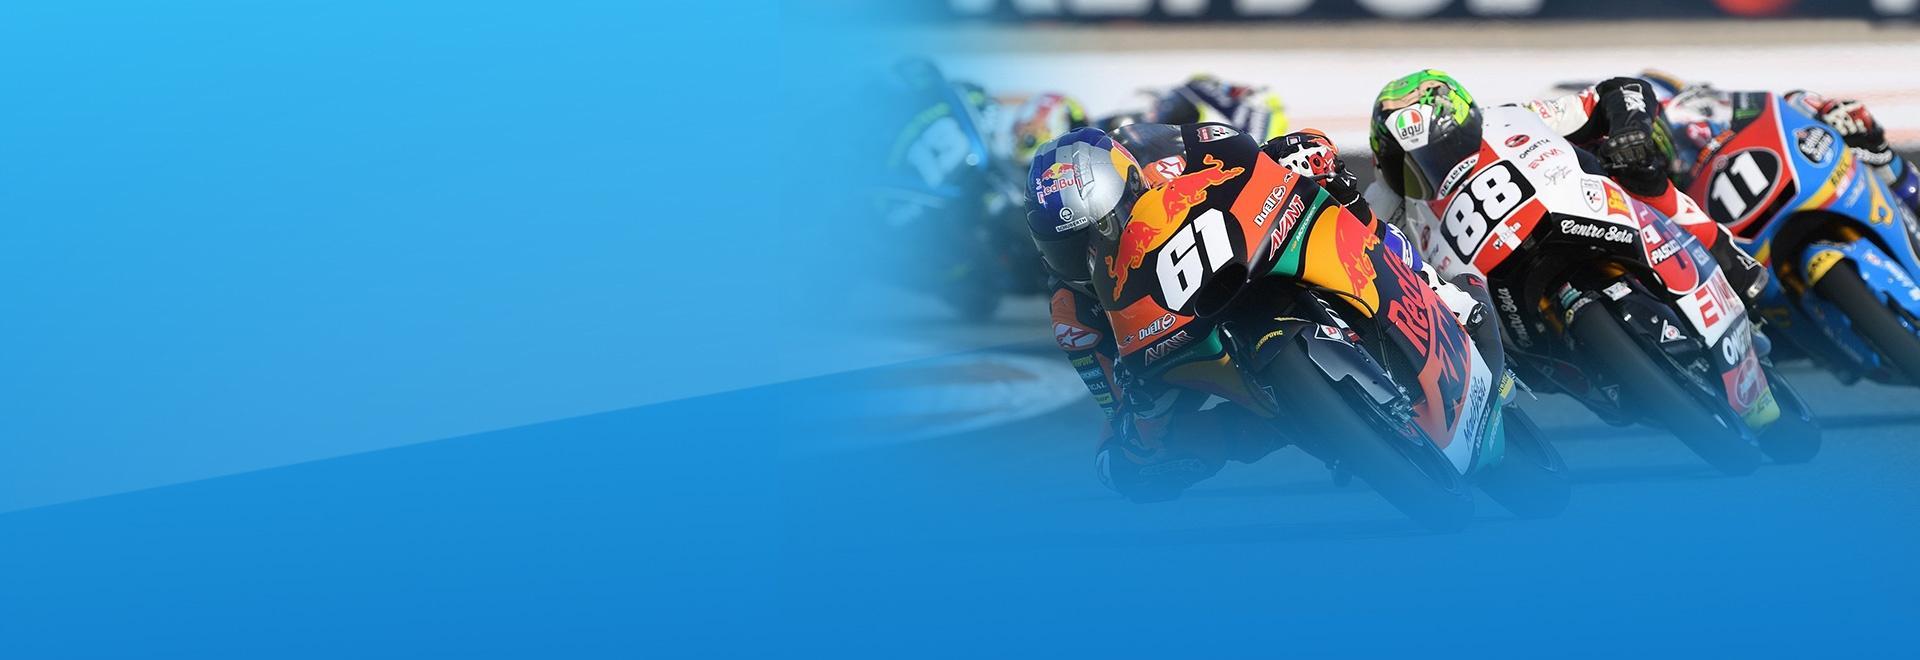 GP Catalunya: Moto3. Gara 1